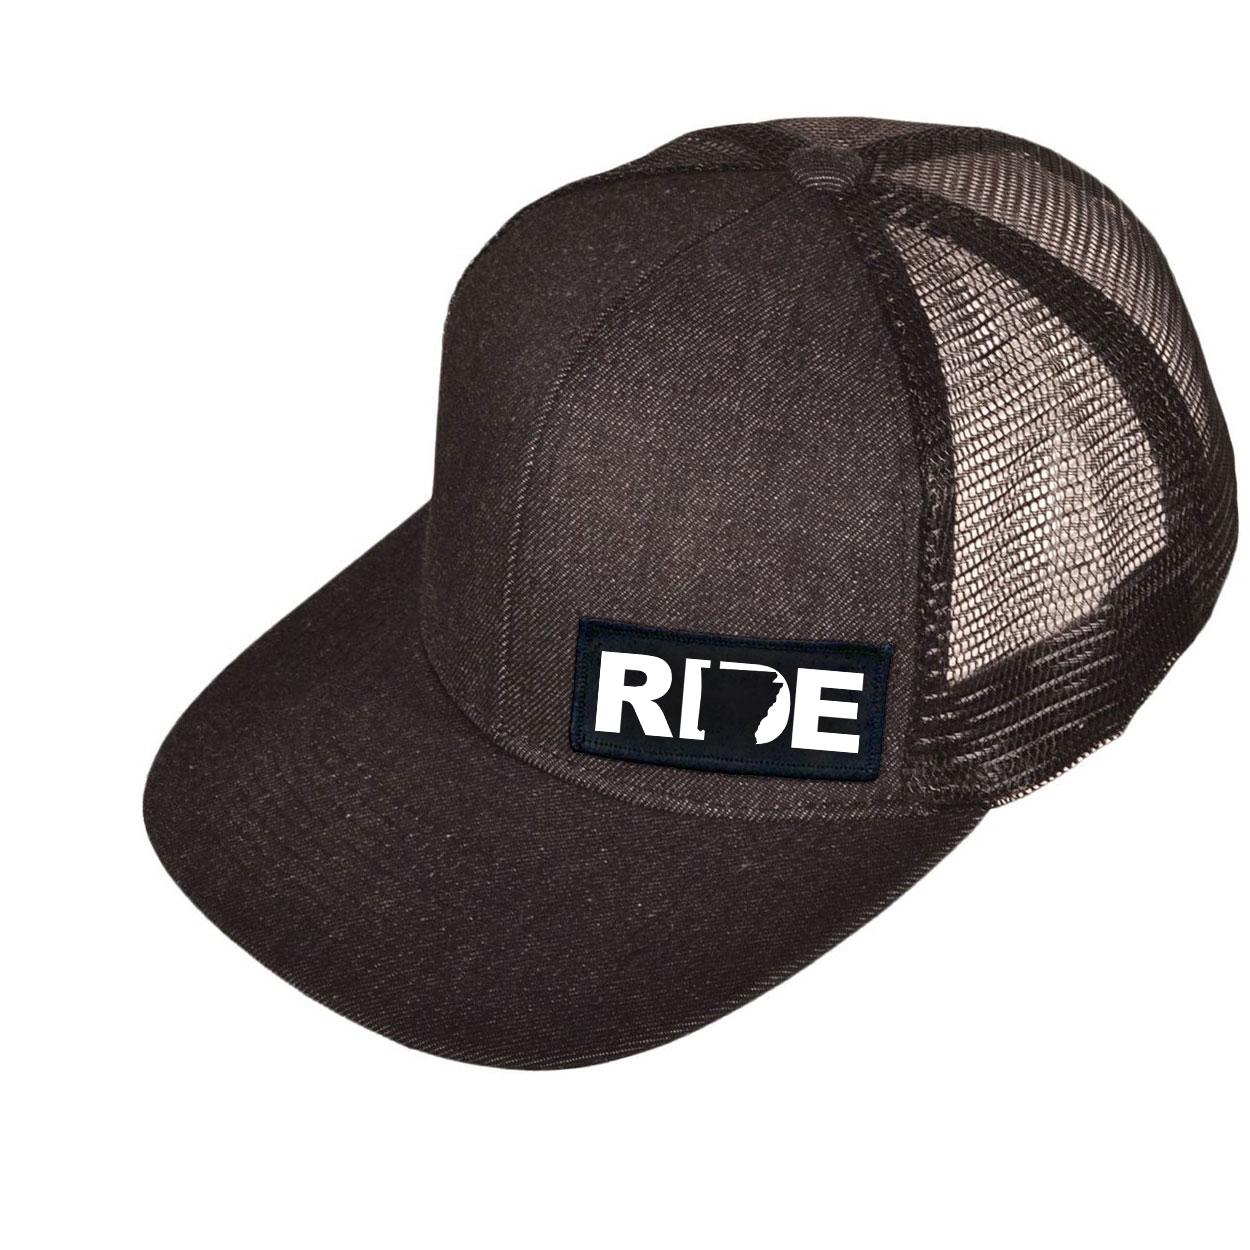 Ride Arkansas Night Out Woven Patch Snapback Flat Brim Hat Black Denim (White Logo)